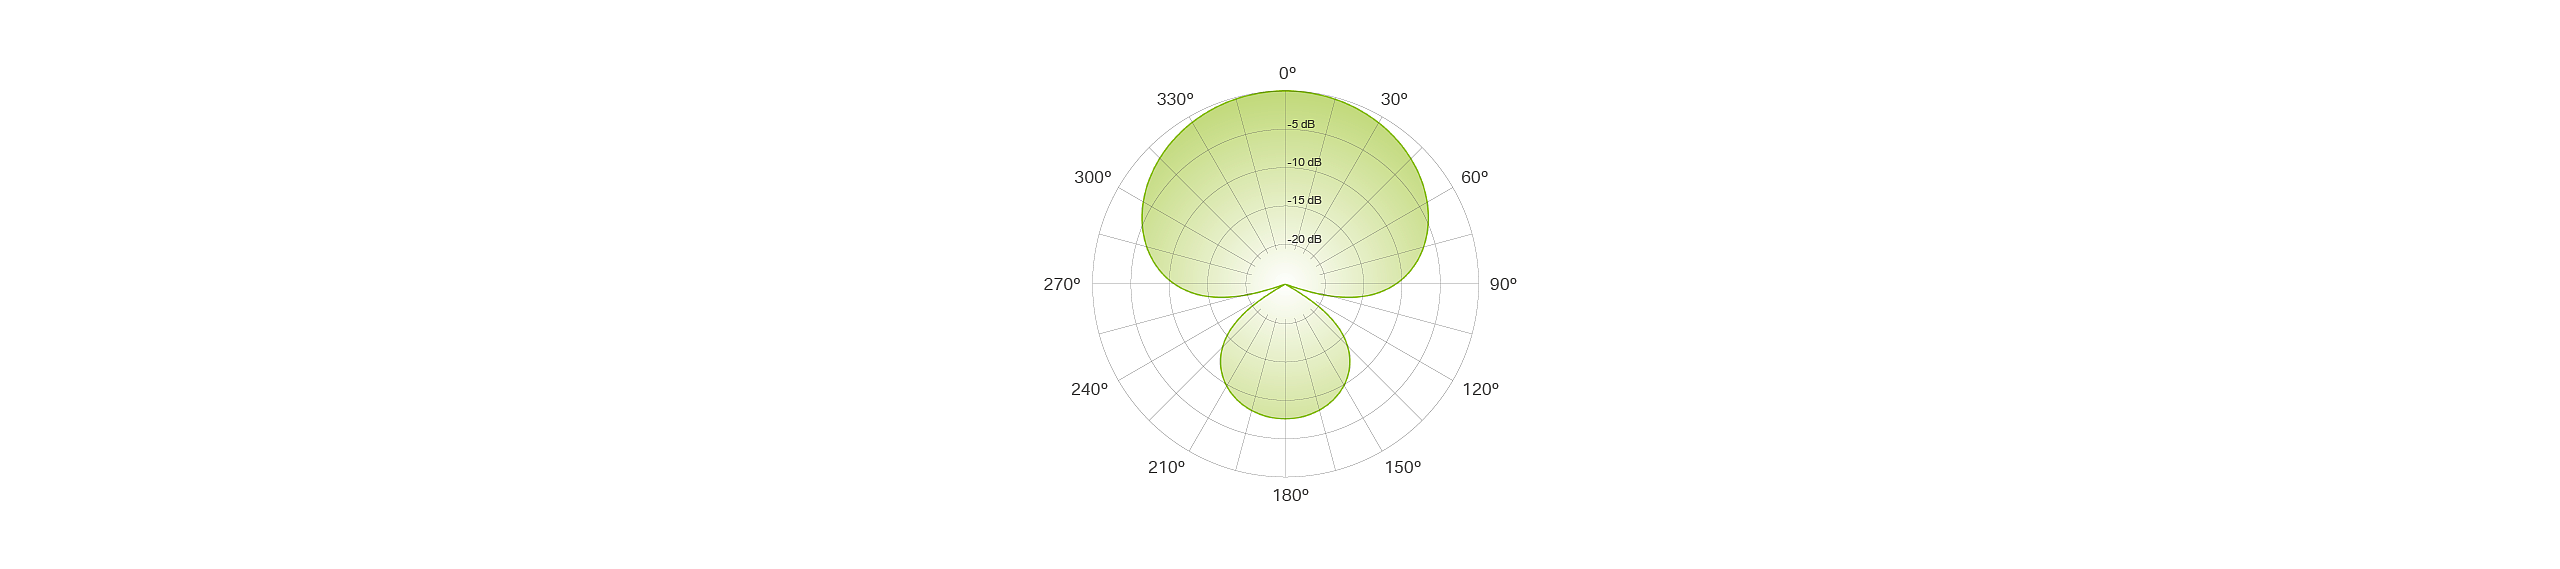 DTP 340 TT polar pattern